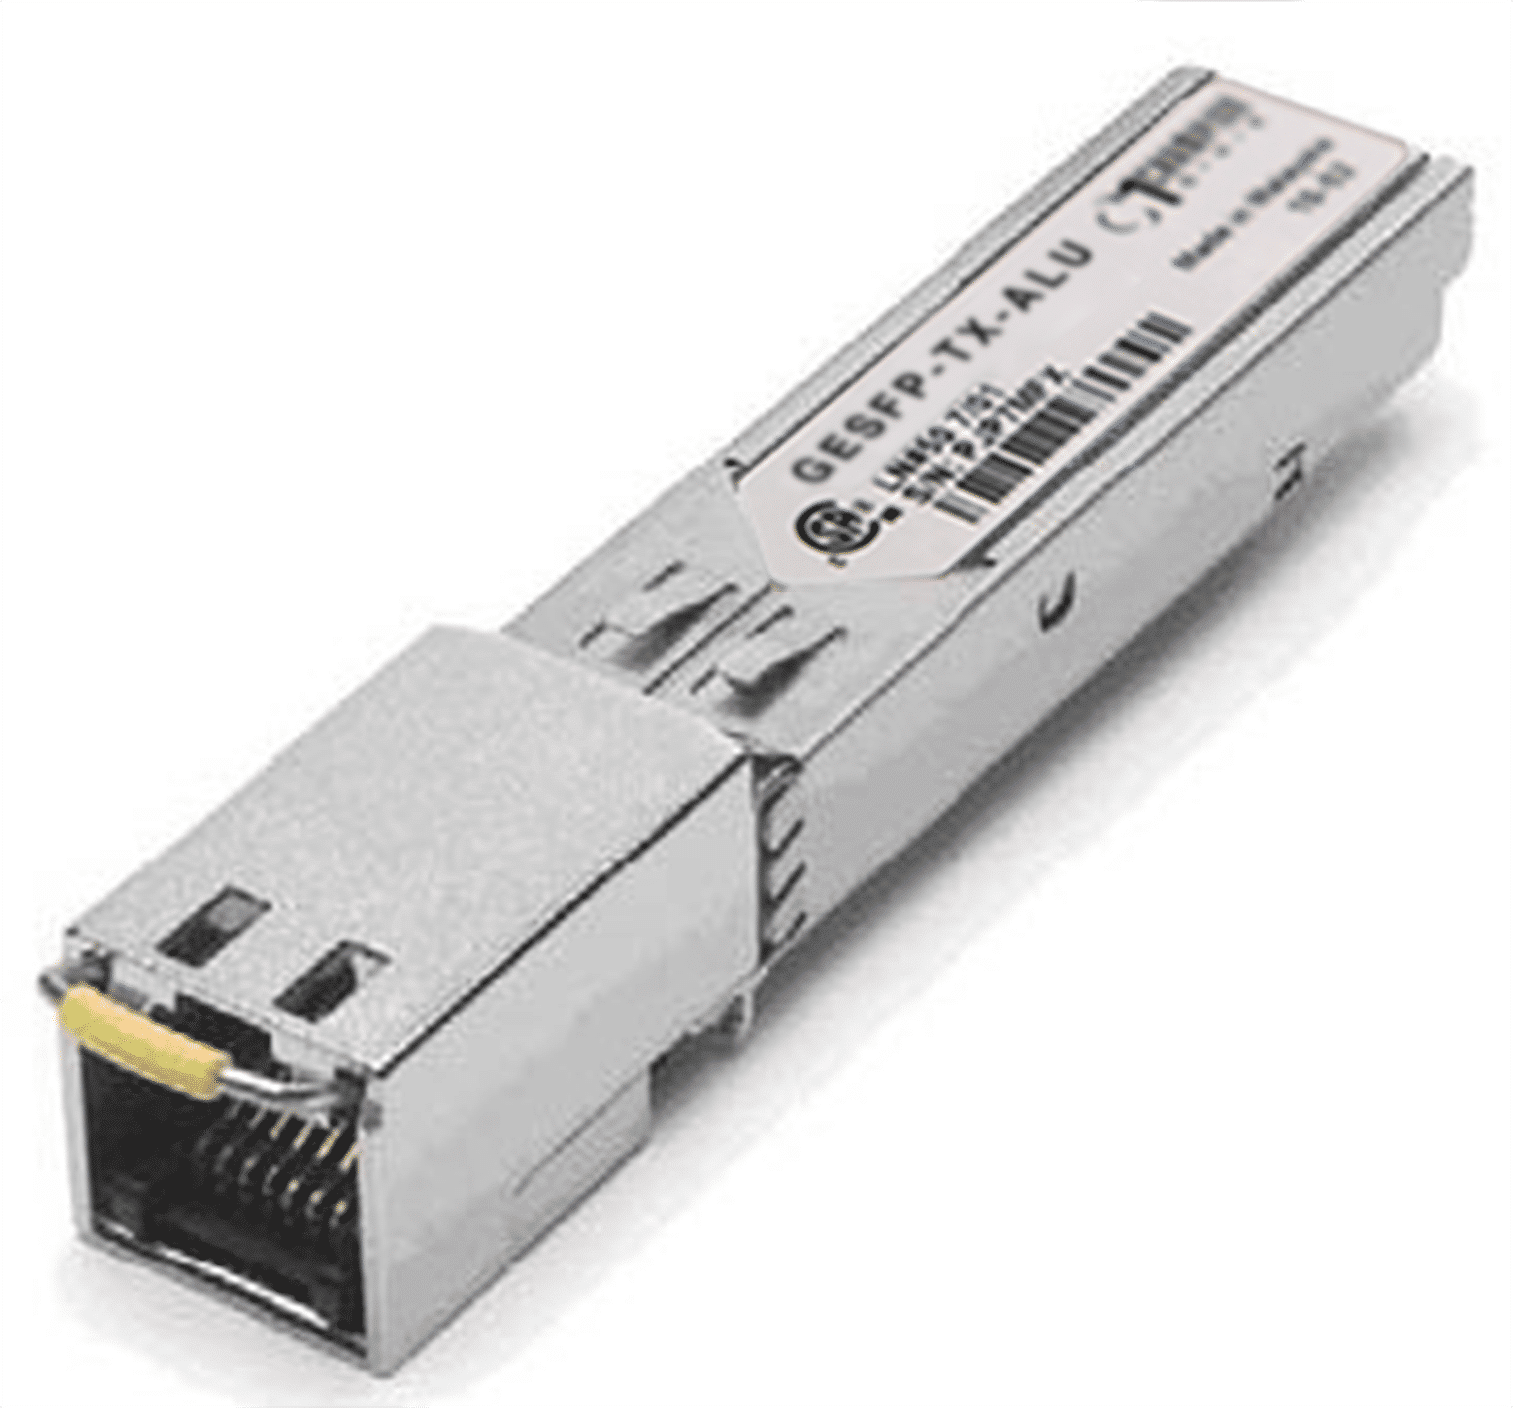 SFP 1000Base-T 100m Transceiver, Nokia/ALU compatible SFP-GIG-T